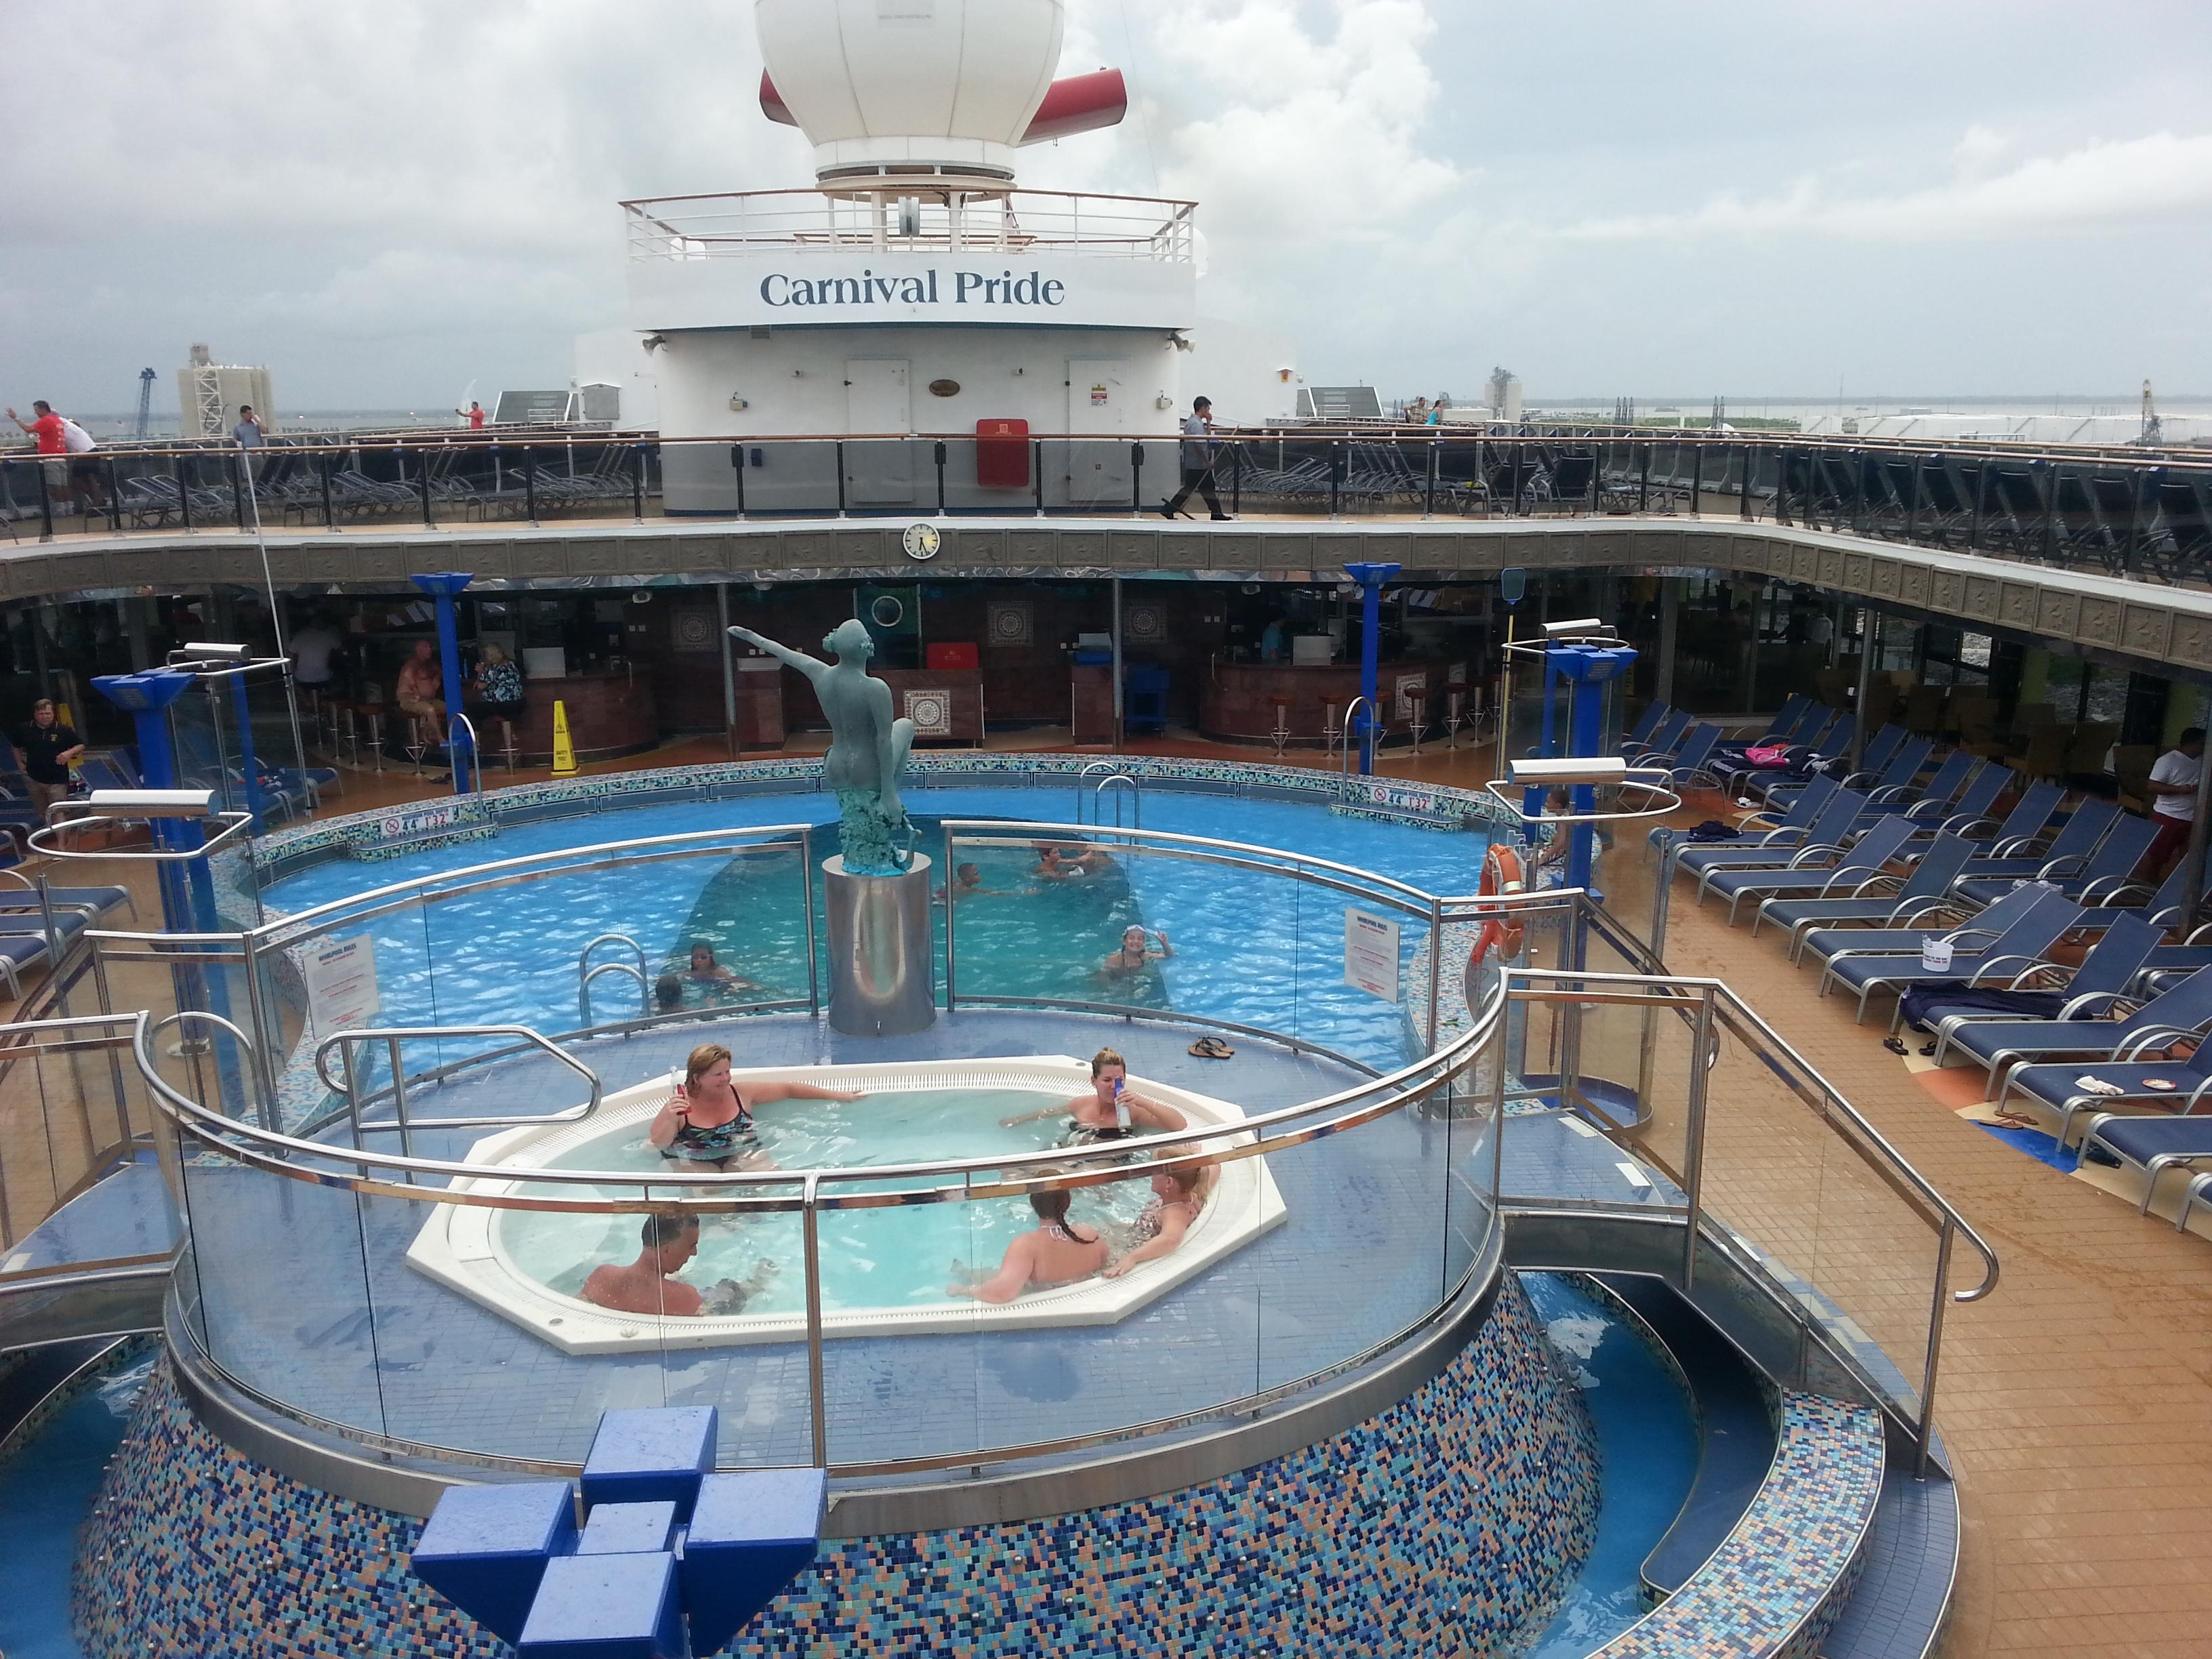 Bahama Cruise Carnival Pride Cruise Review